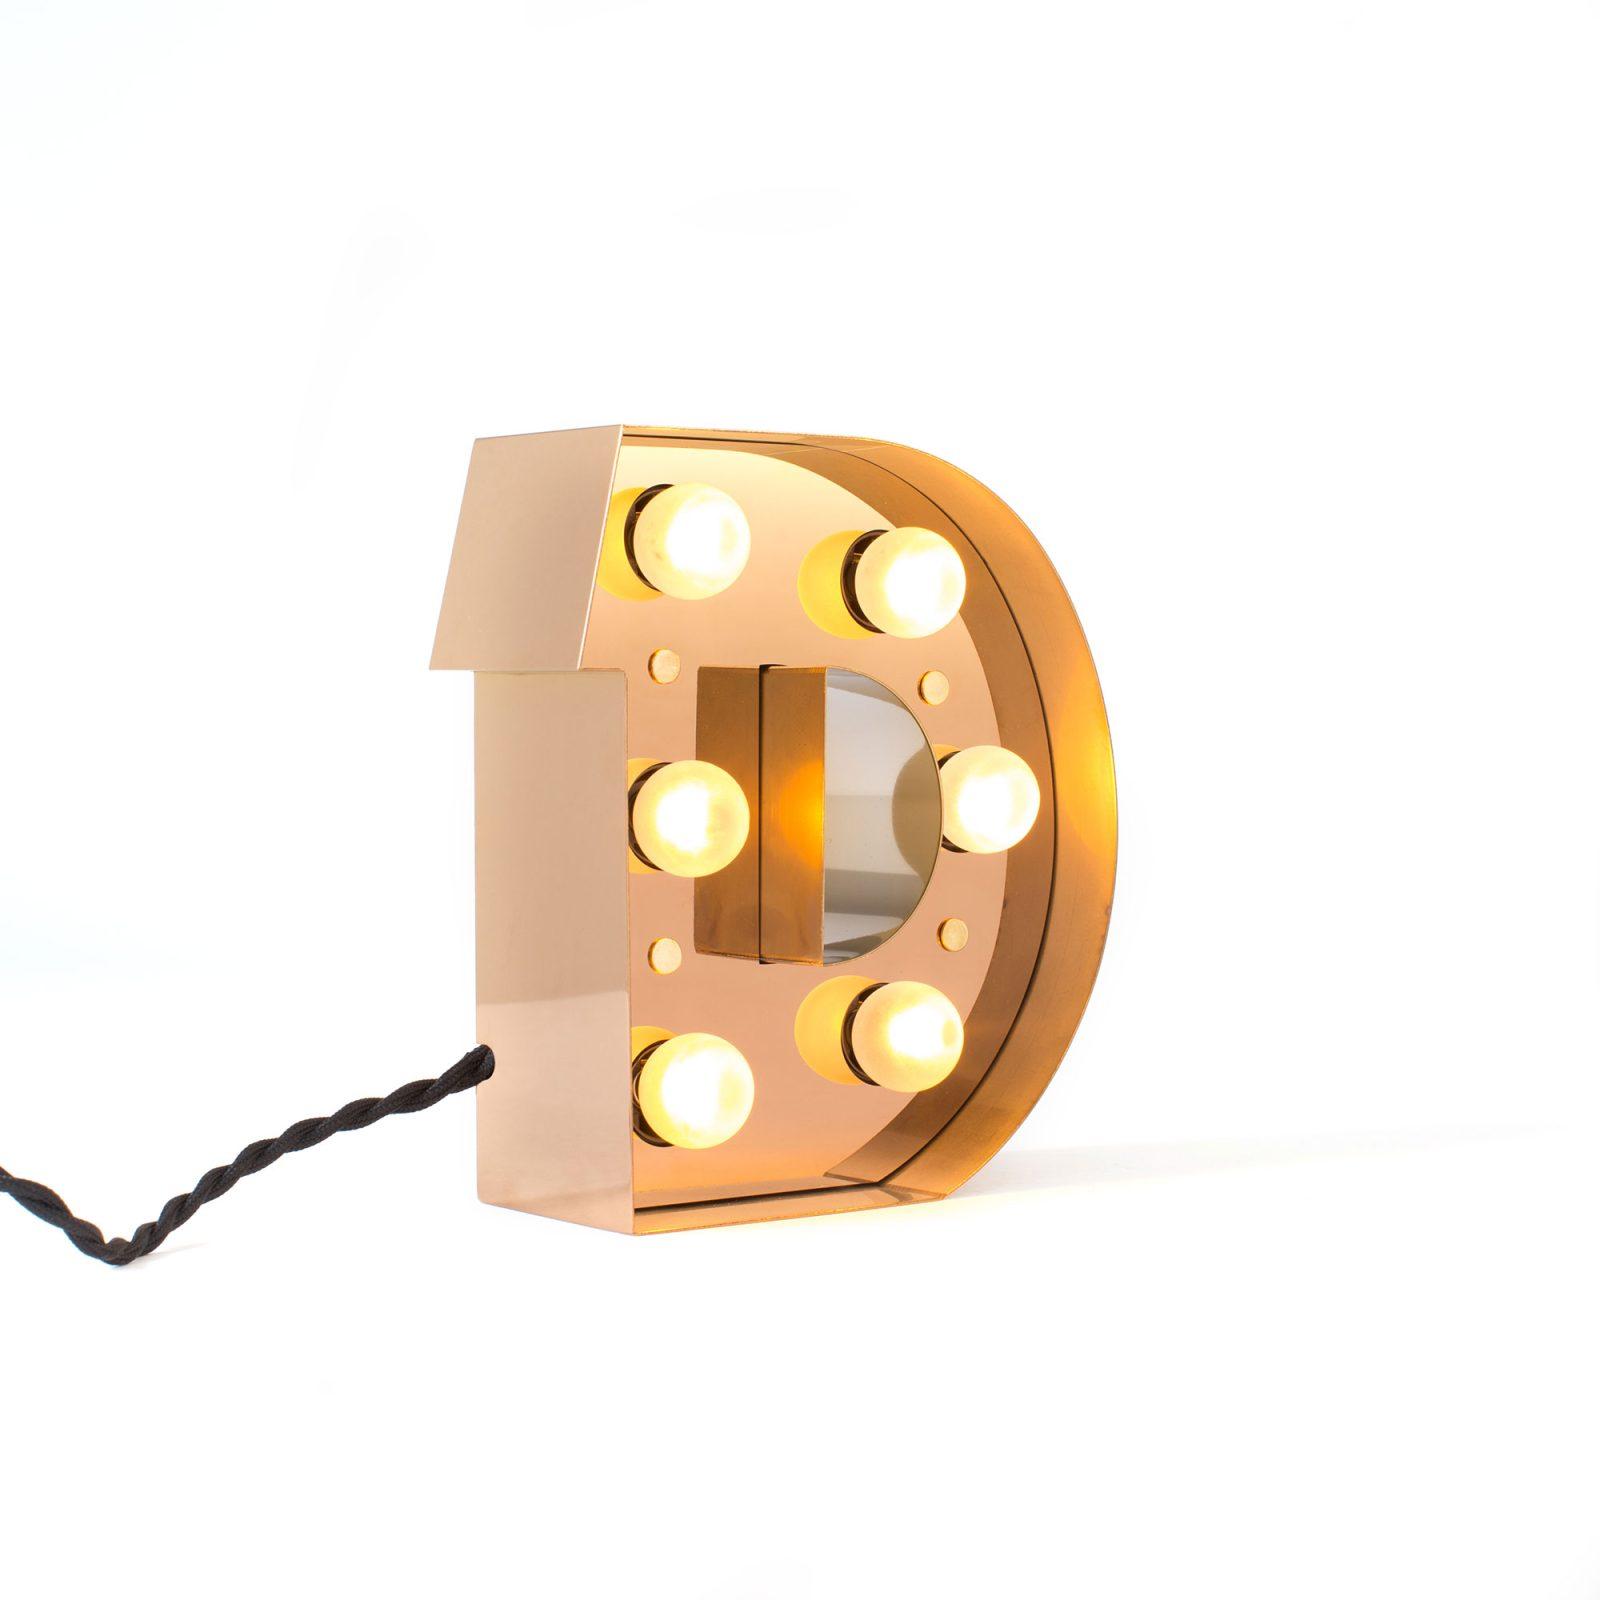 Caractère Alphabet Lights, D-34470